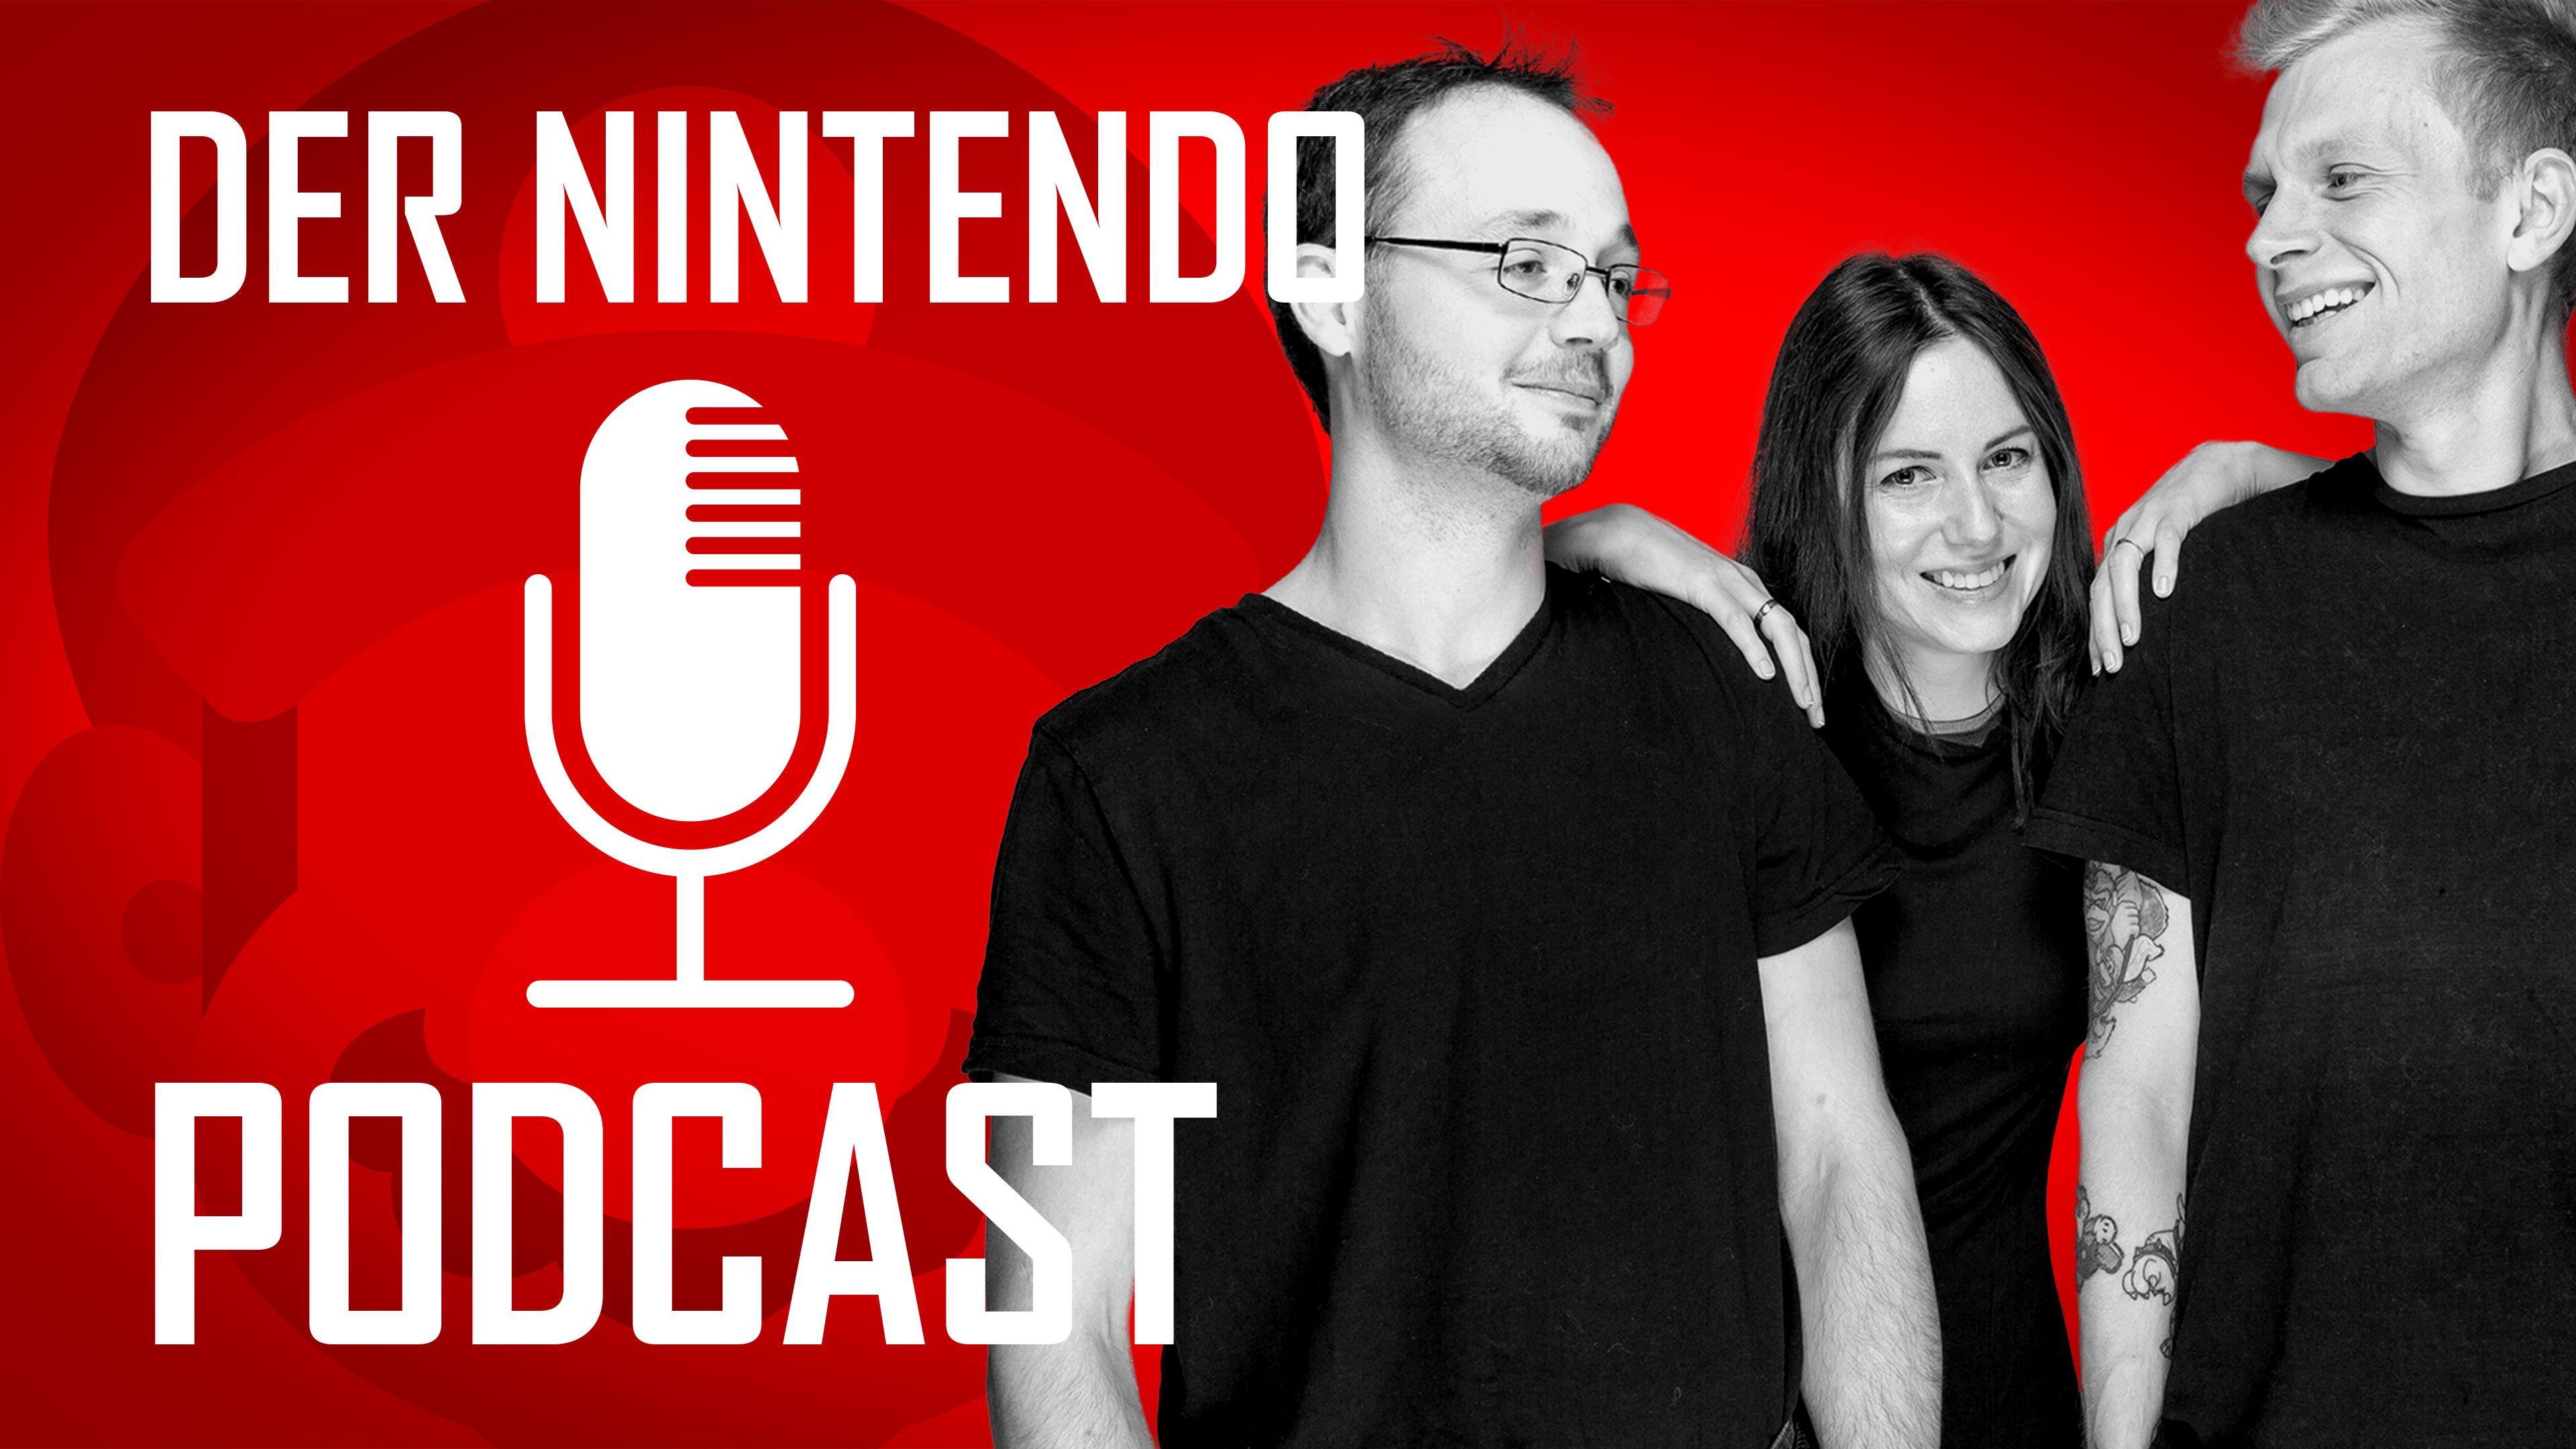 The Nintendo Podcast # 143: Super Mario 64 - Analysis of a Masterpiece